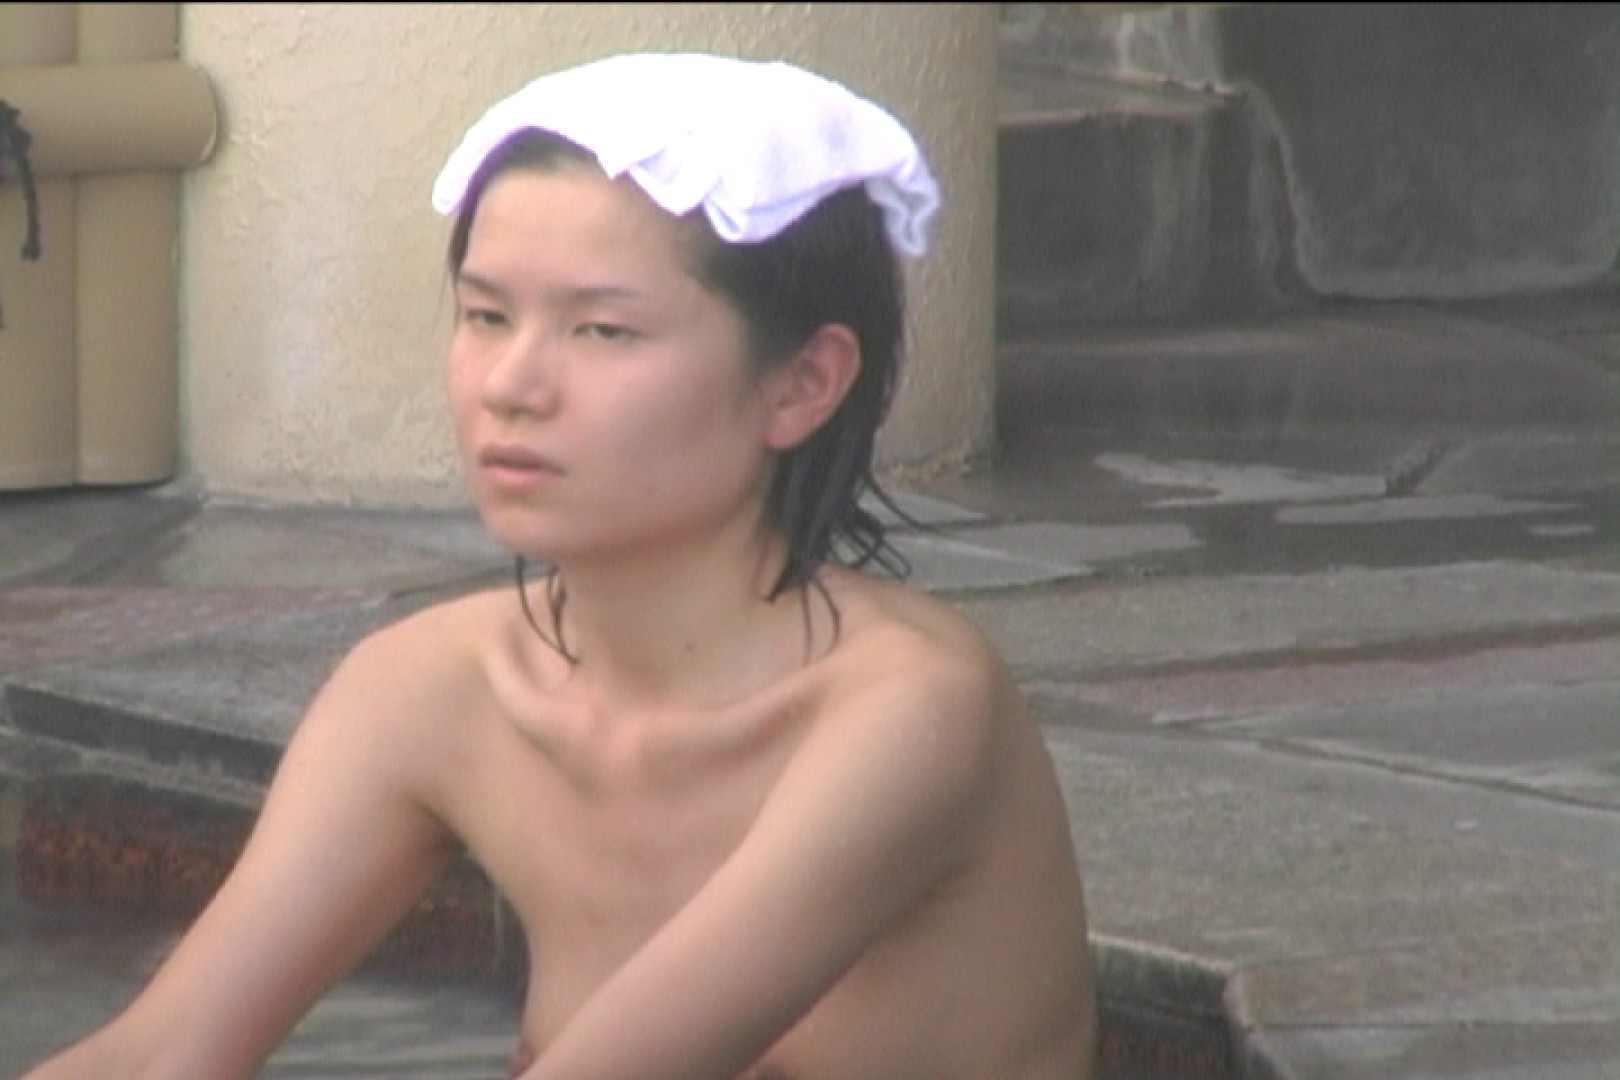 Aquaな露天風呂Vol.530 盗撮 | HなOL  88pic 73